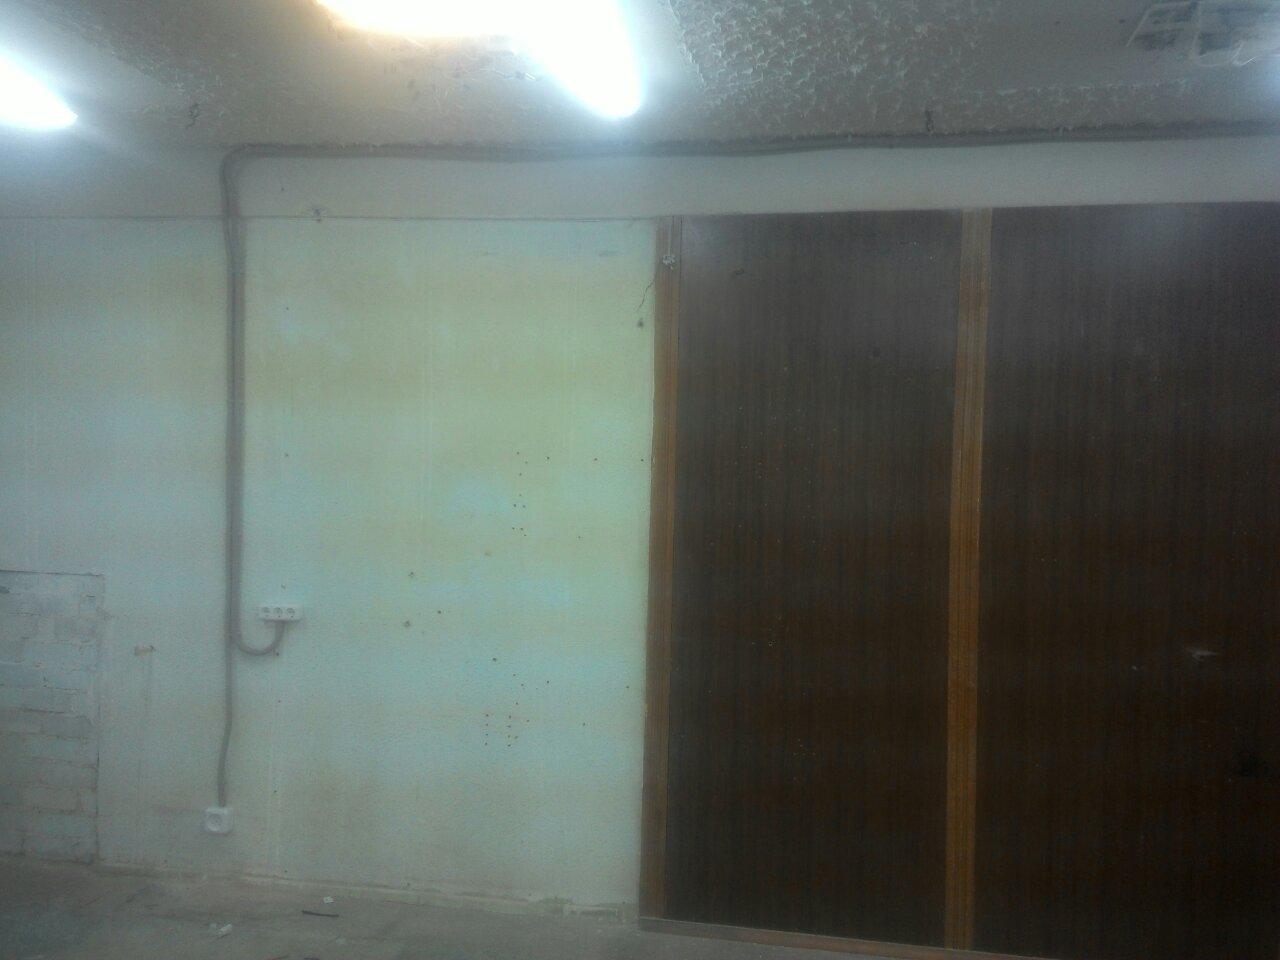 Мебельное производство, монтаж проводки